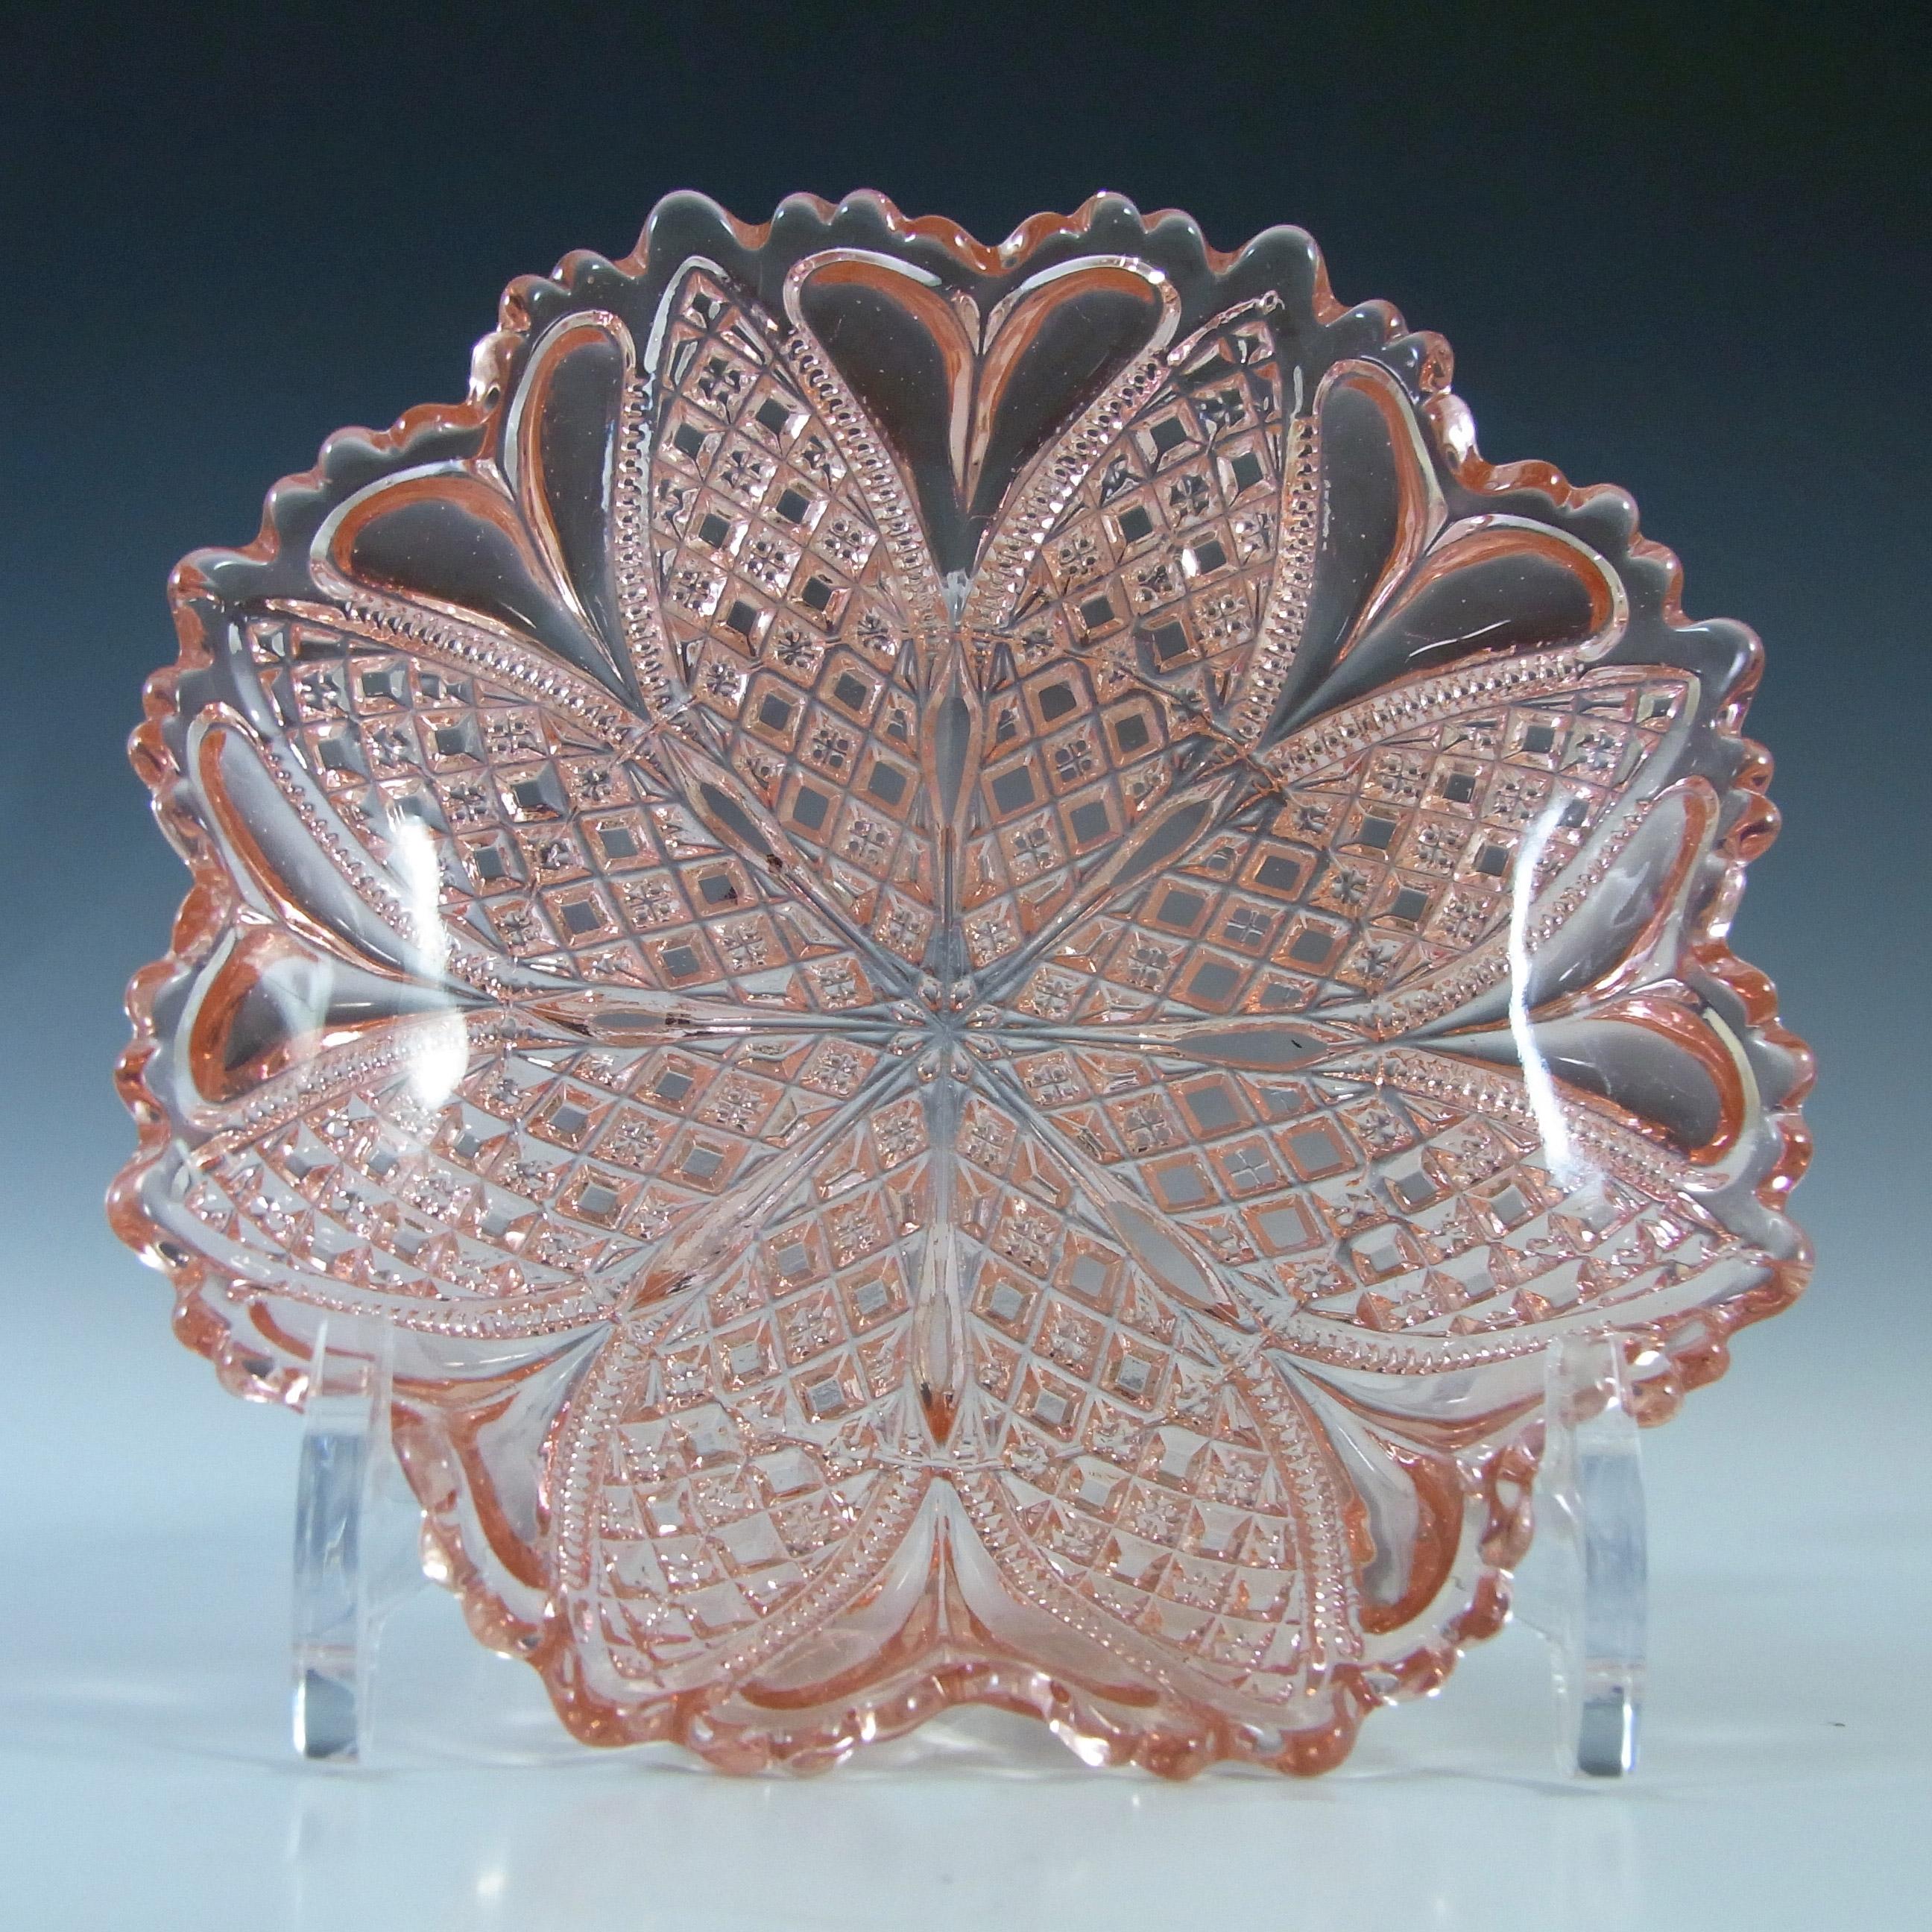 Davidson Victorian Pink Pressed Glass 'William & Mary' Bowl